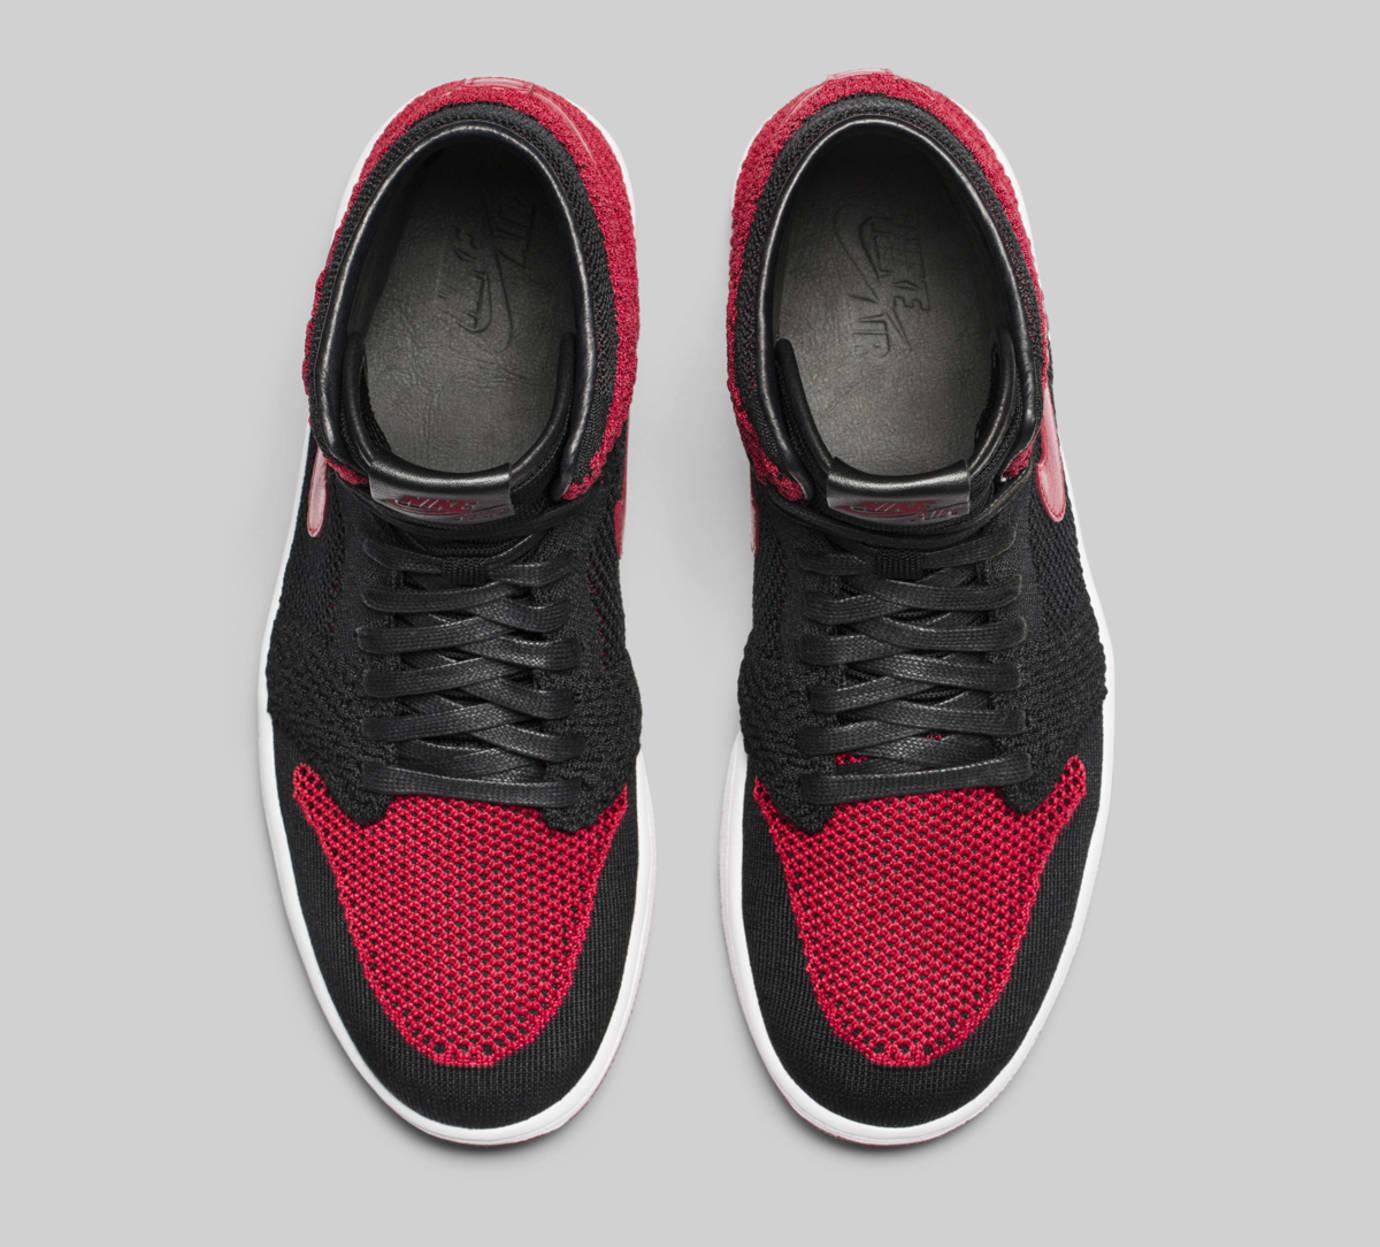 Banned Air Jordan 1 Flyknit 919704-001 Top